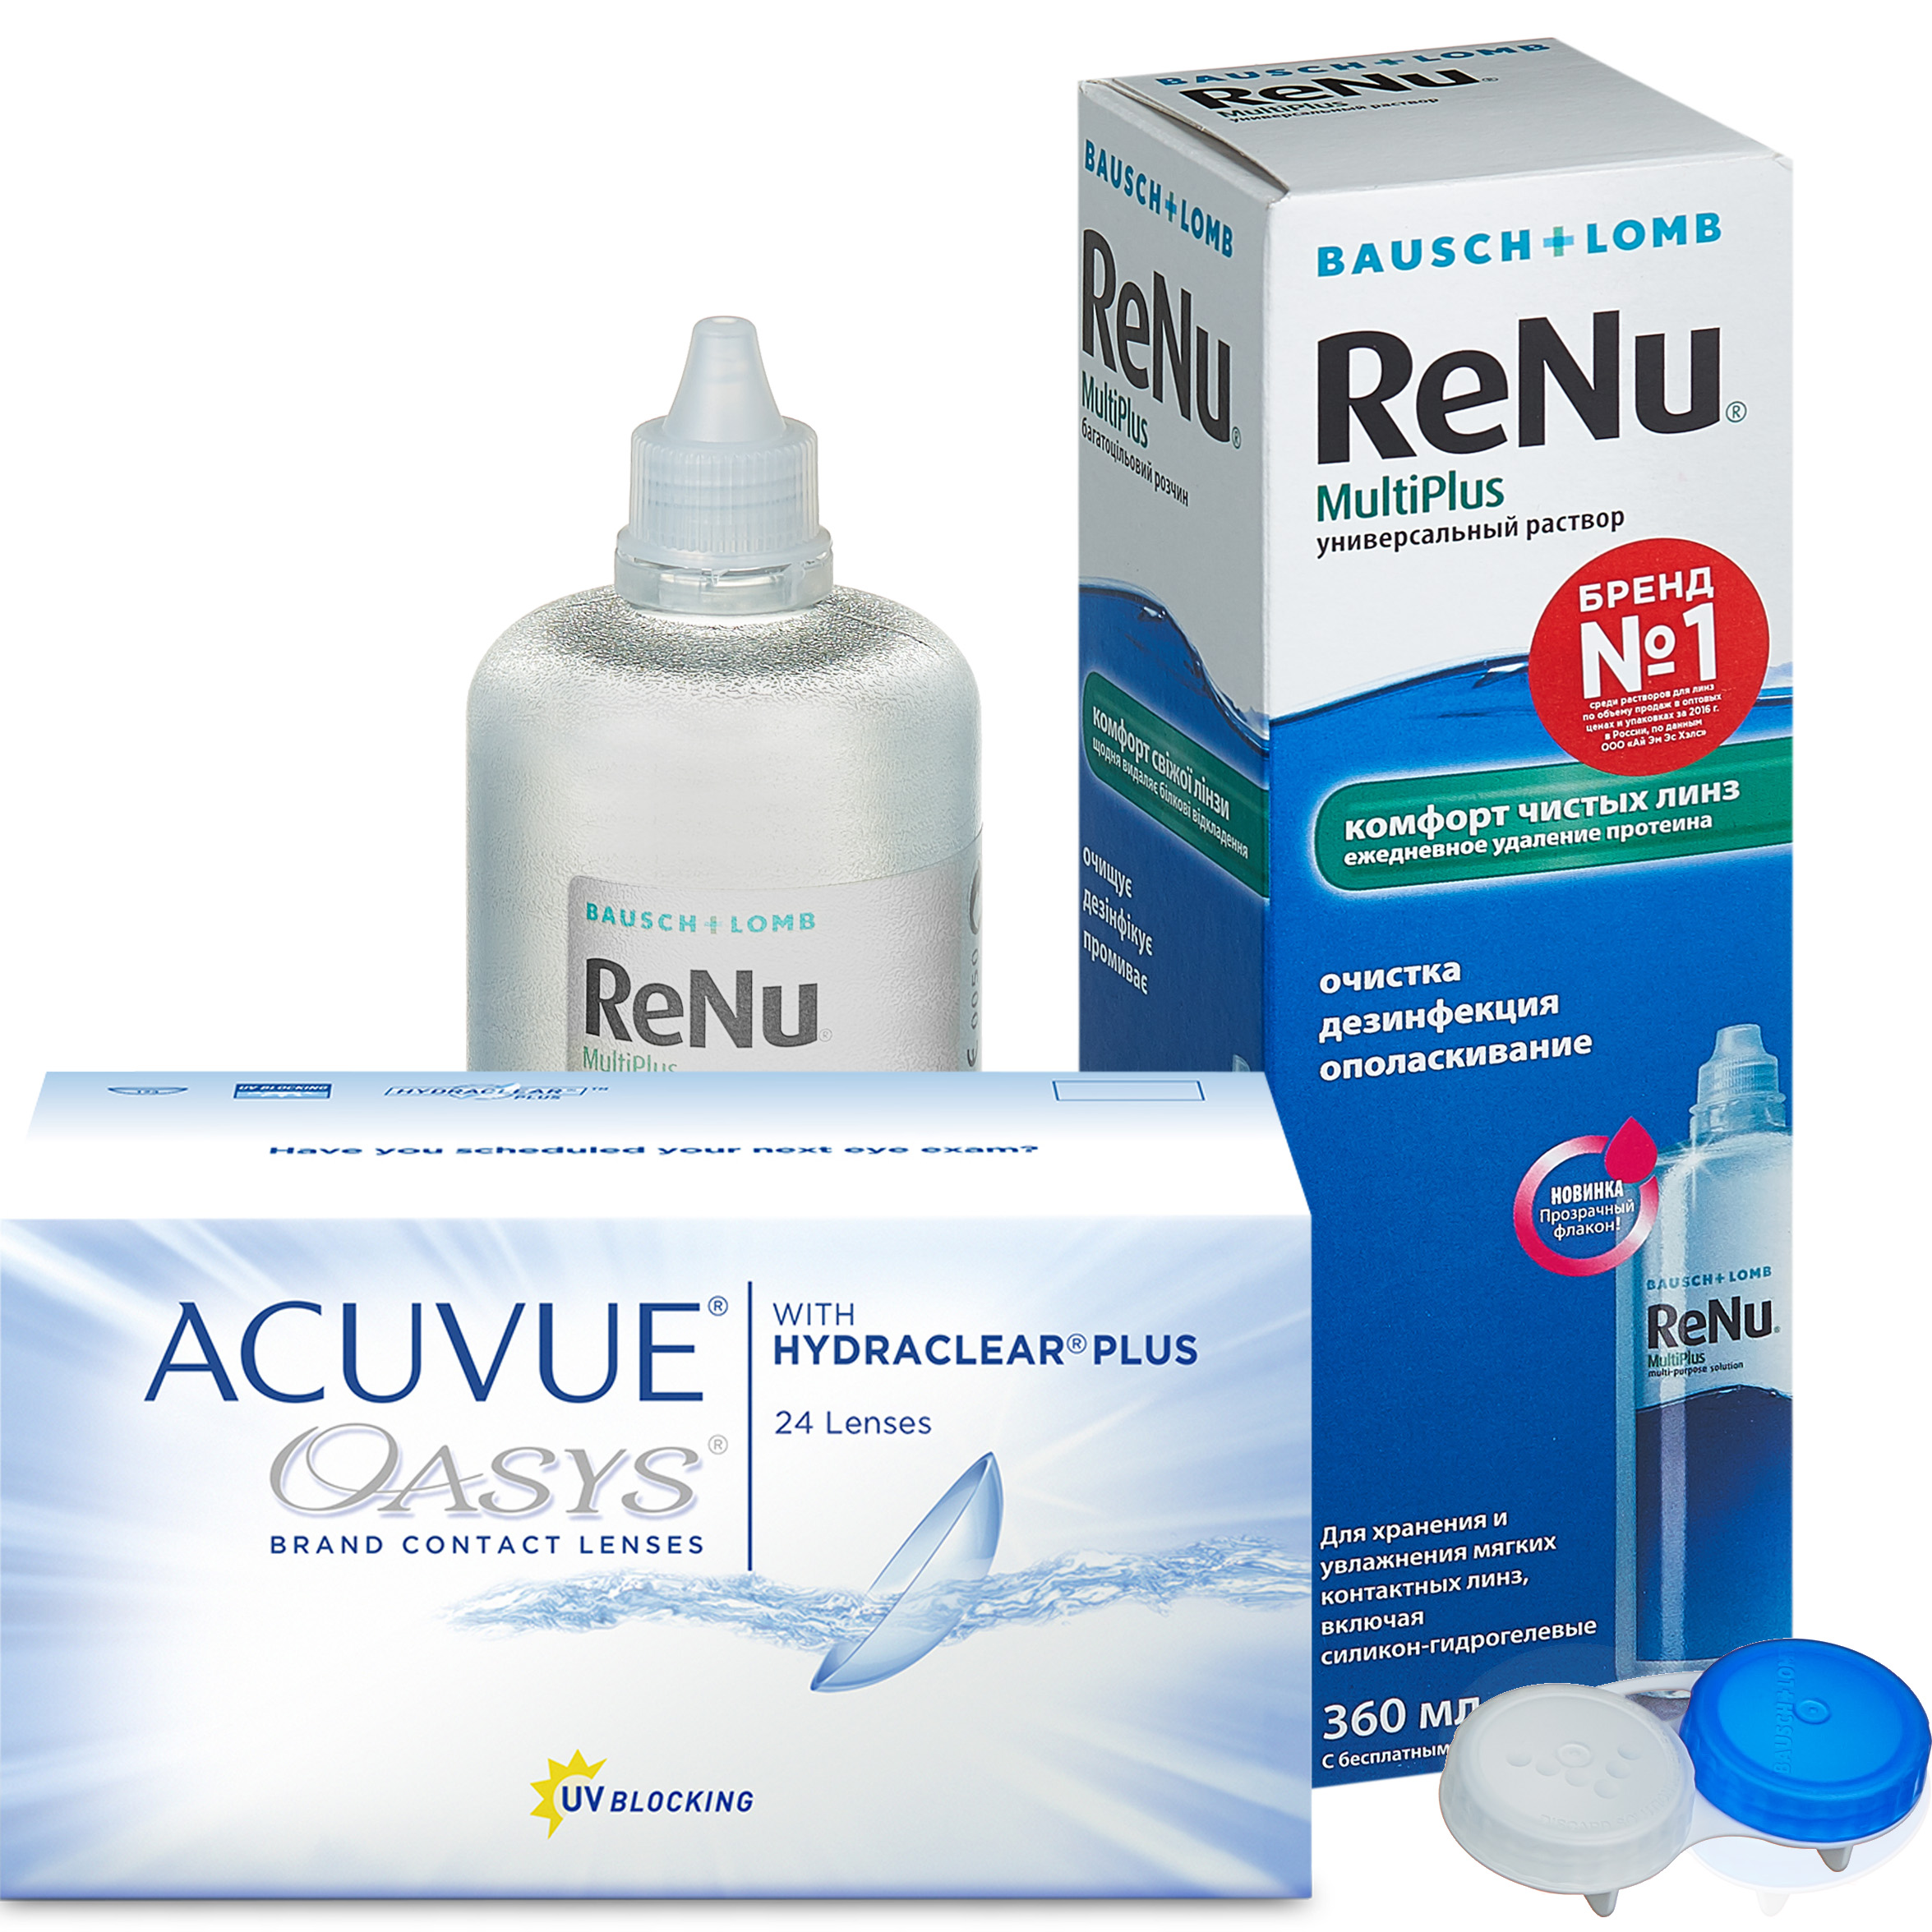 Купить Oasys with Hydraclear Plus 24 линзы + ReNu MultiPlus, Линзы Acuvue Oasys with Hydraclear Plus 24 линзы R 8.4 +5, 00 + ReNu Multi Plus 360 мл